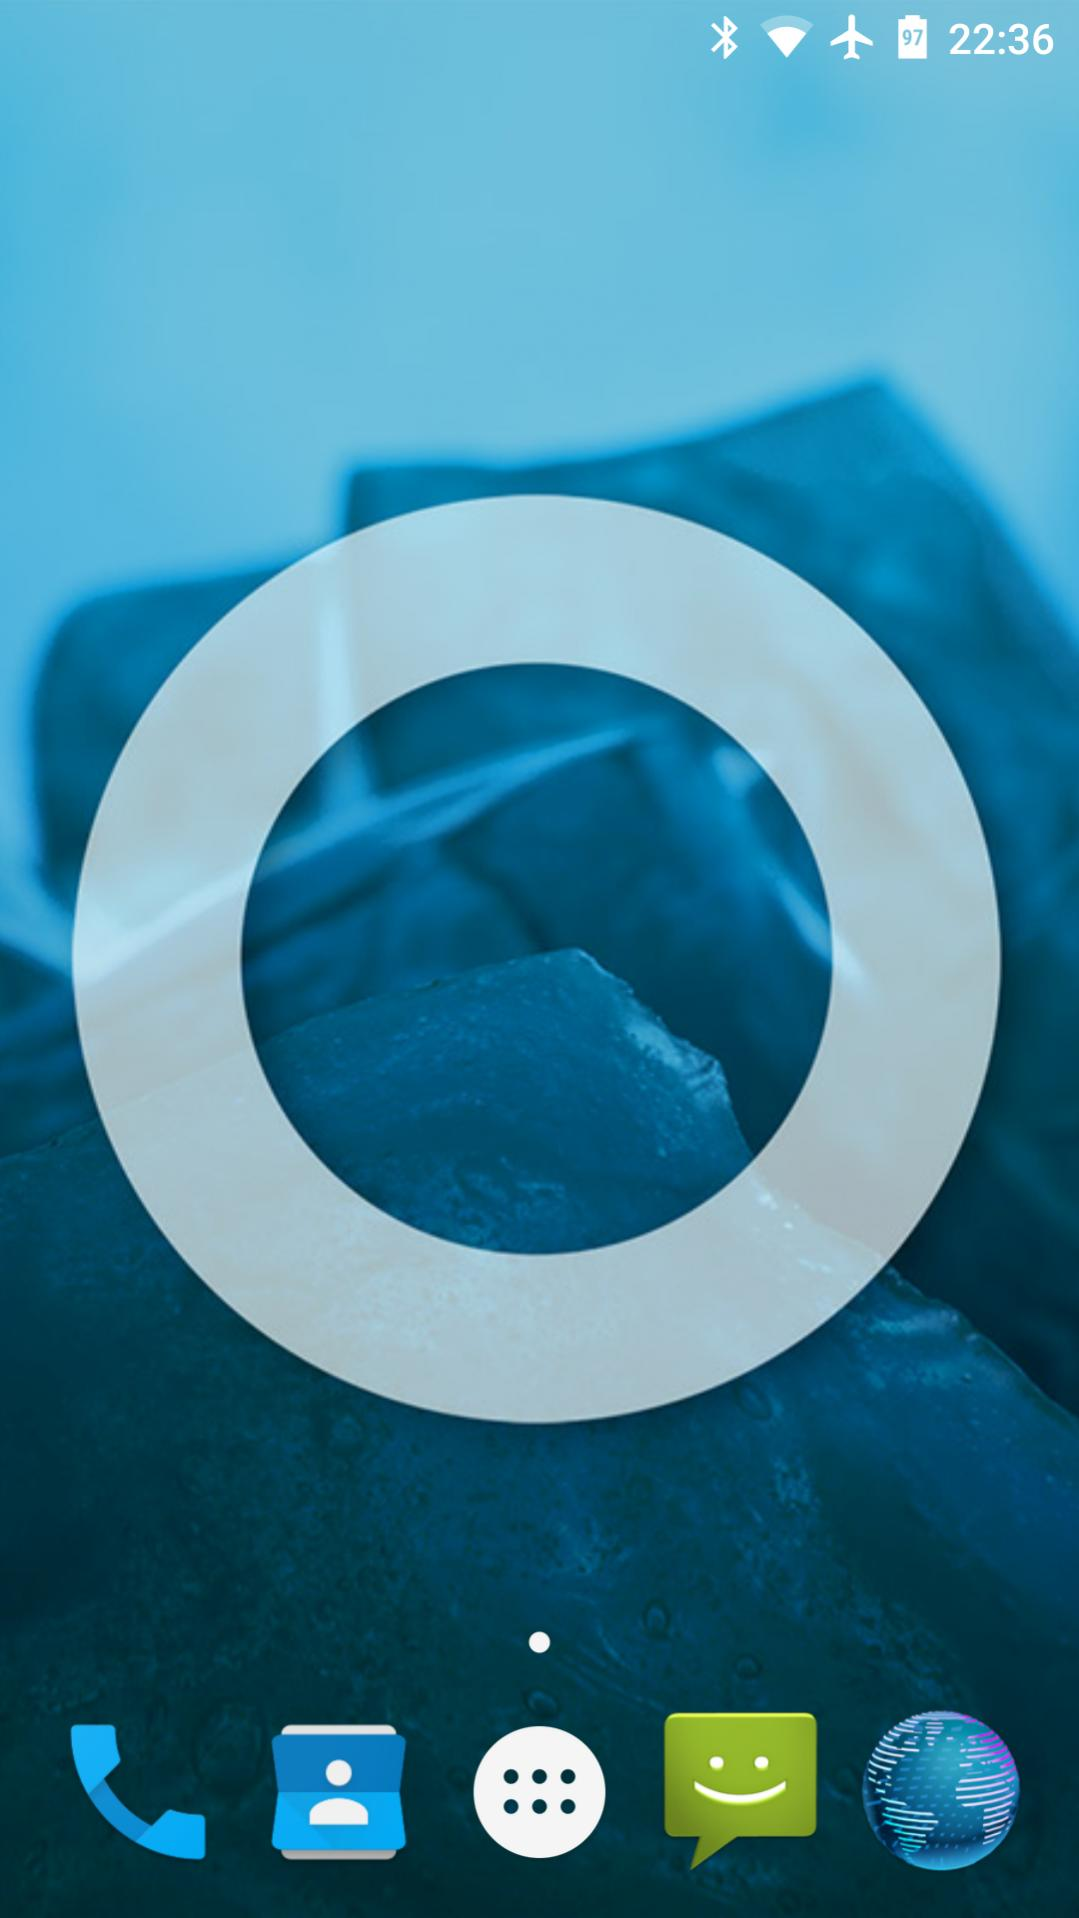 Samsung-Galaxy-S4-CyanogenMod-12-Android-5.0-Lollipop-2